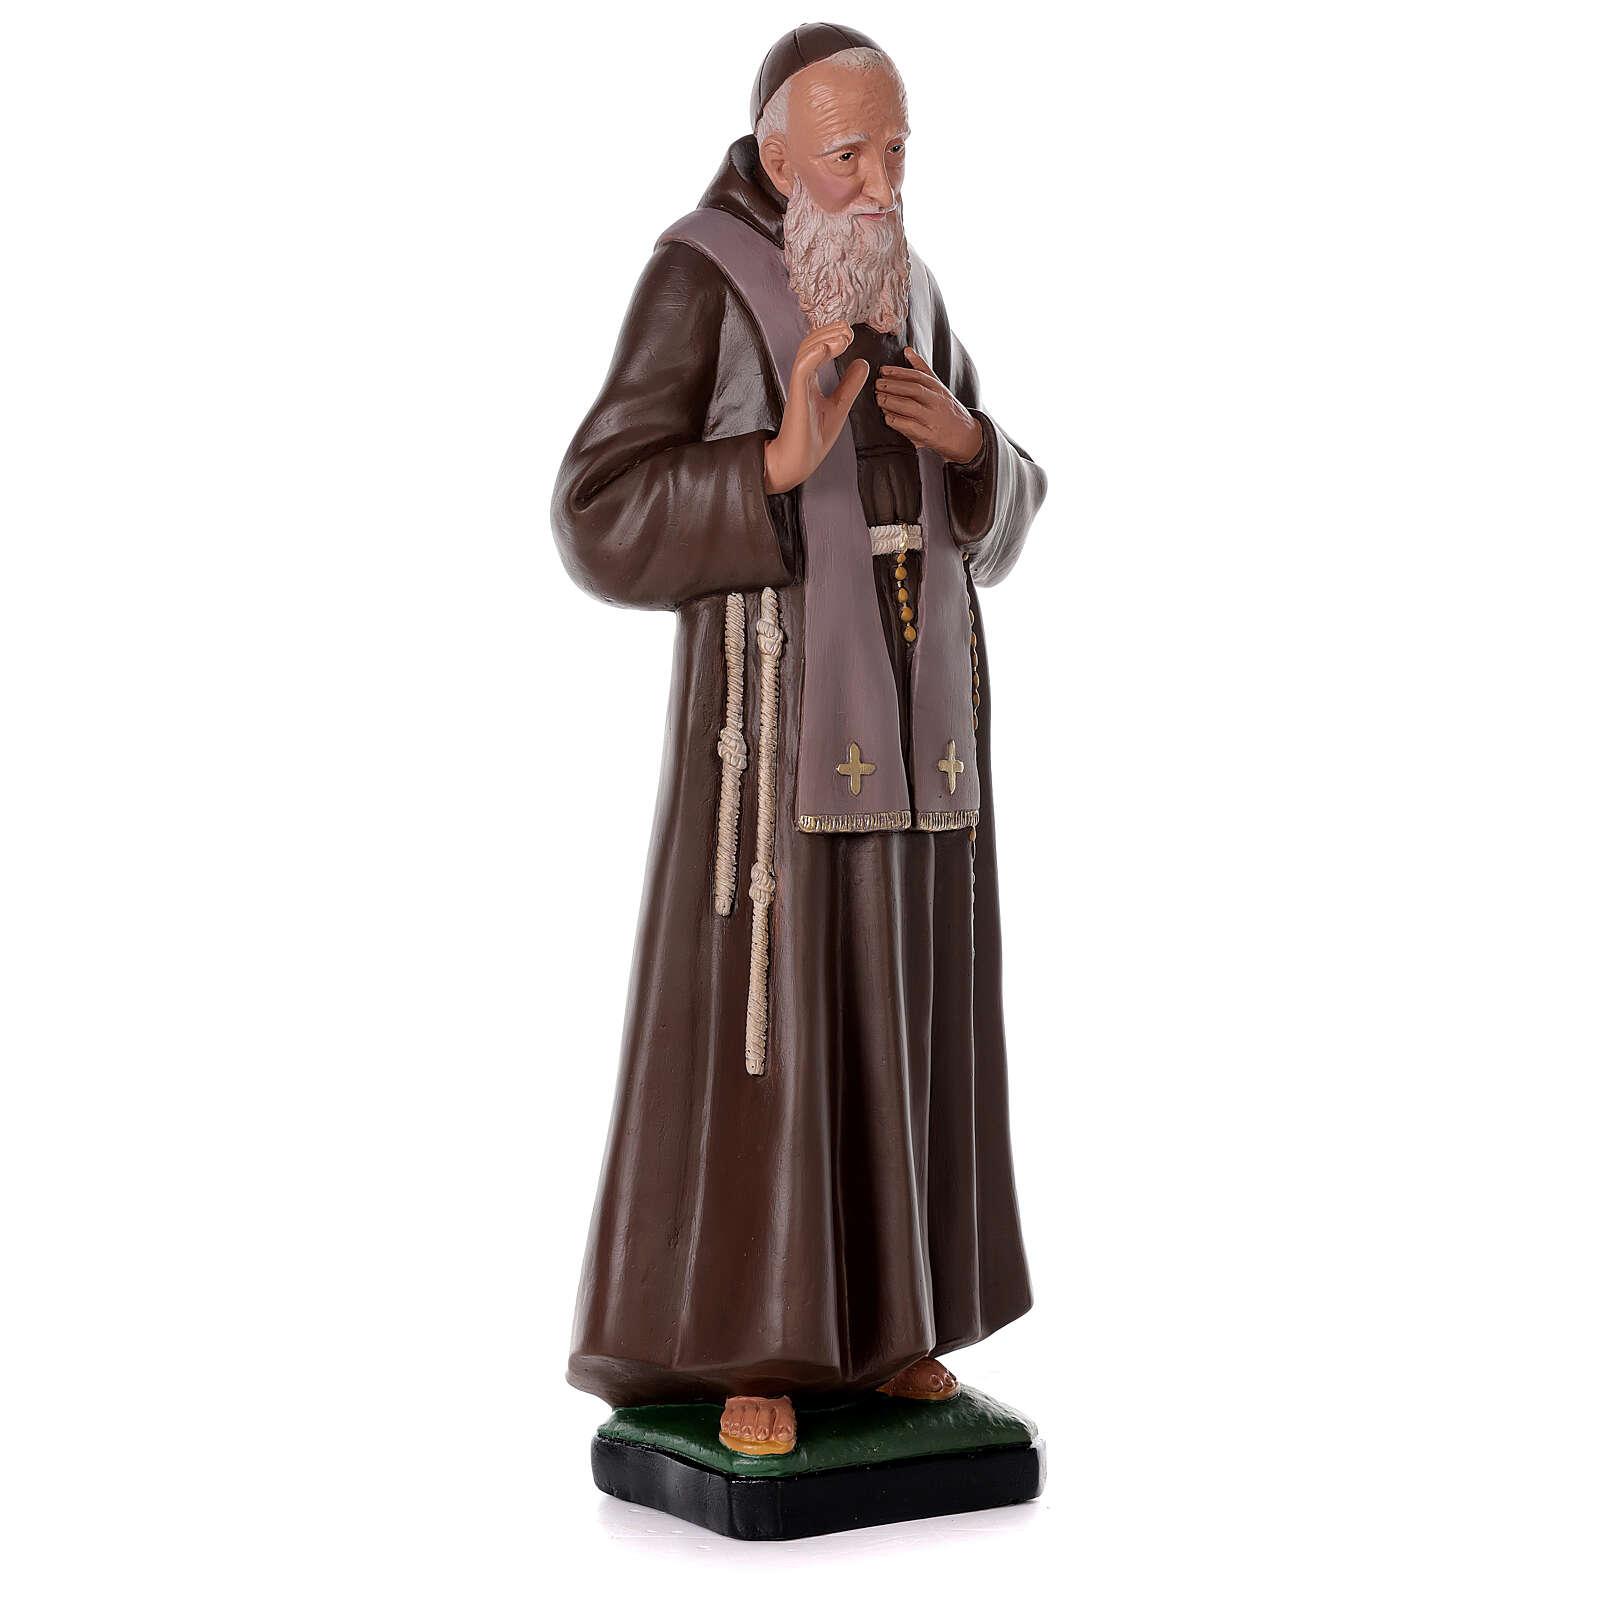 Statue of Saint Leopold 32 in hand-painted plaster Arte Barsanti 4